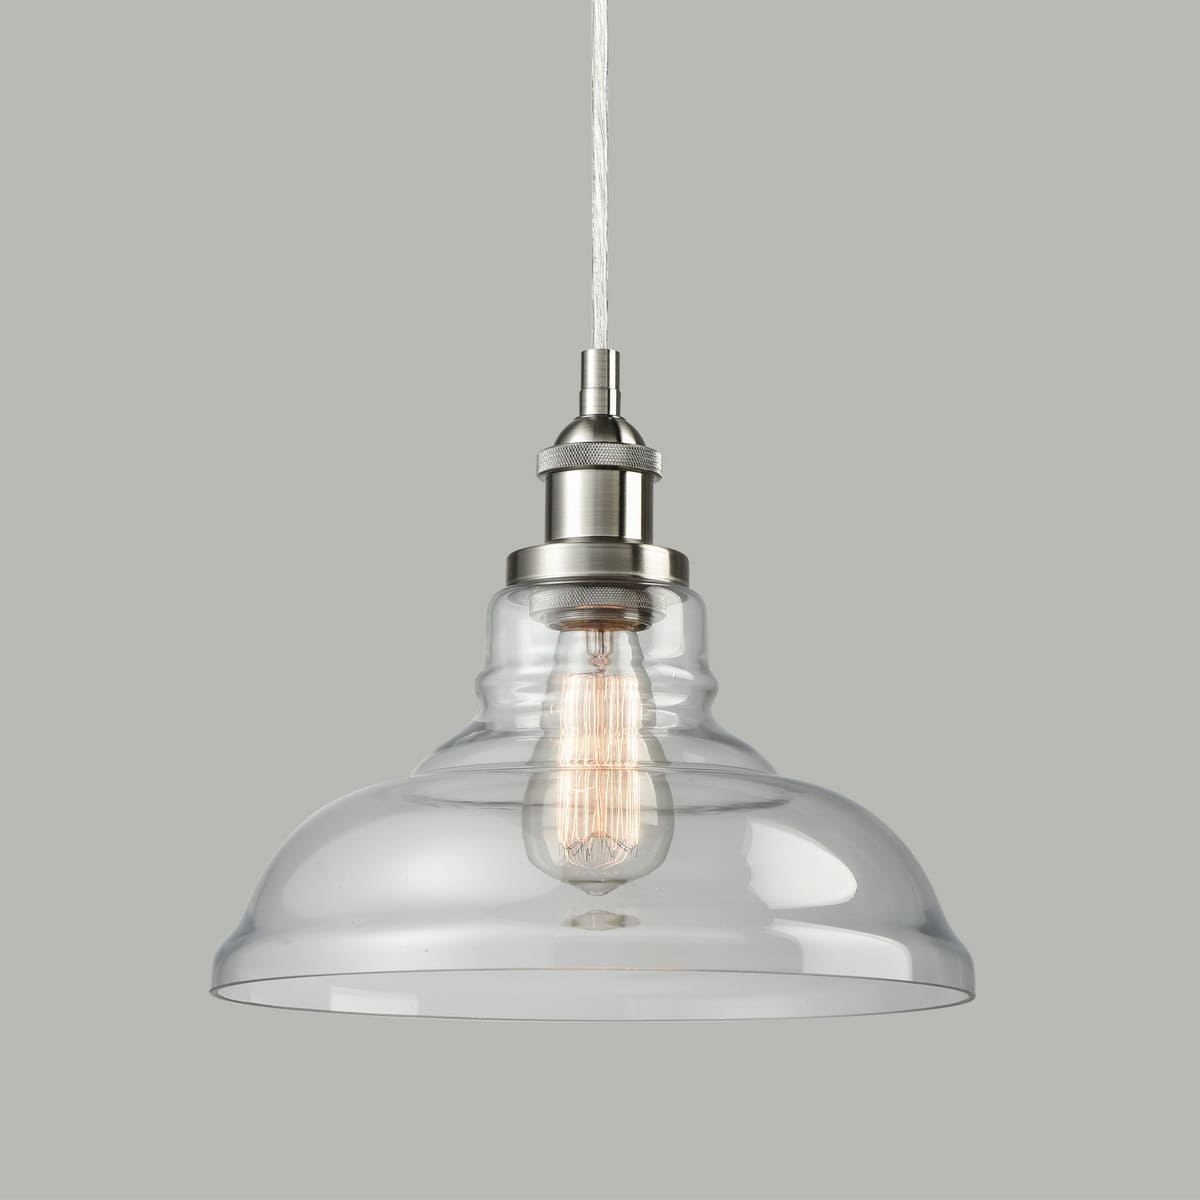 Belajar Brushed Nickel Pendant Lighting Over Kitchen Island